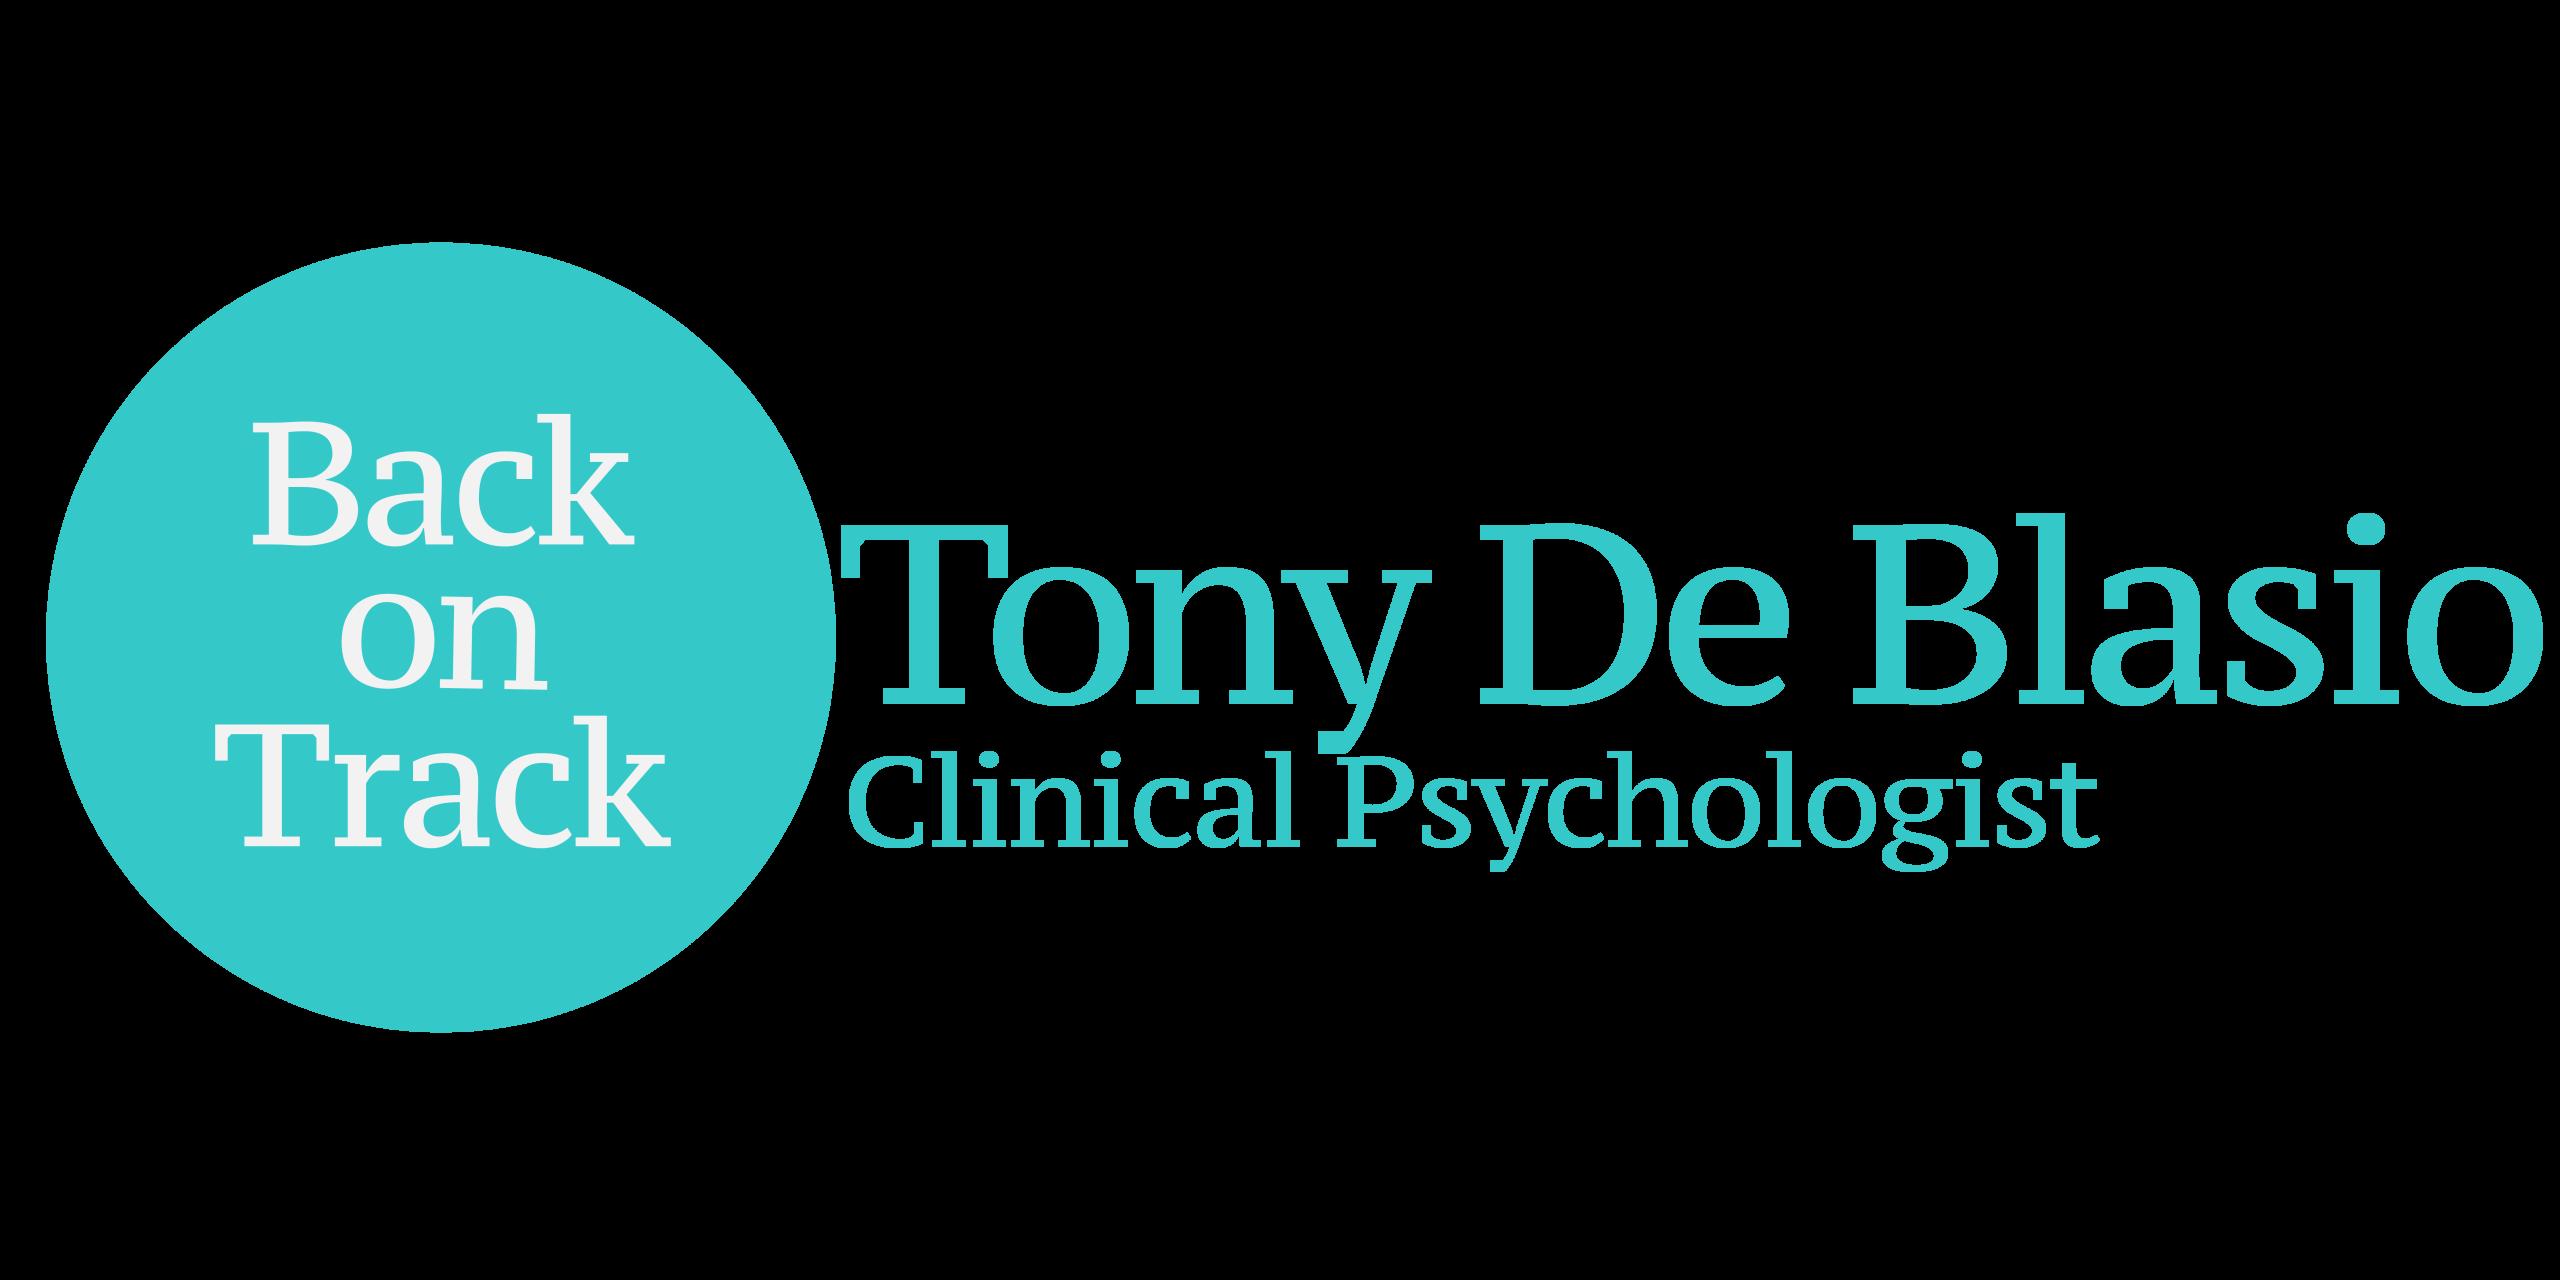 Tony-De-Blasio-Back-On-Track-Psychological-Services-scaled